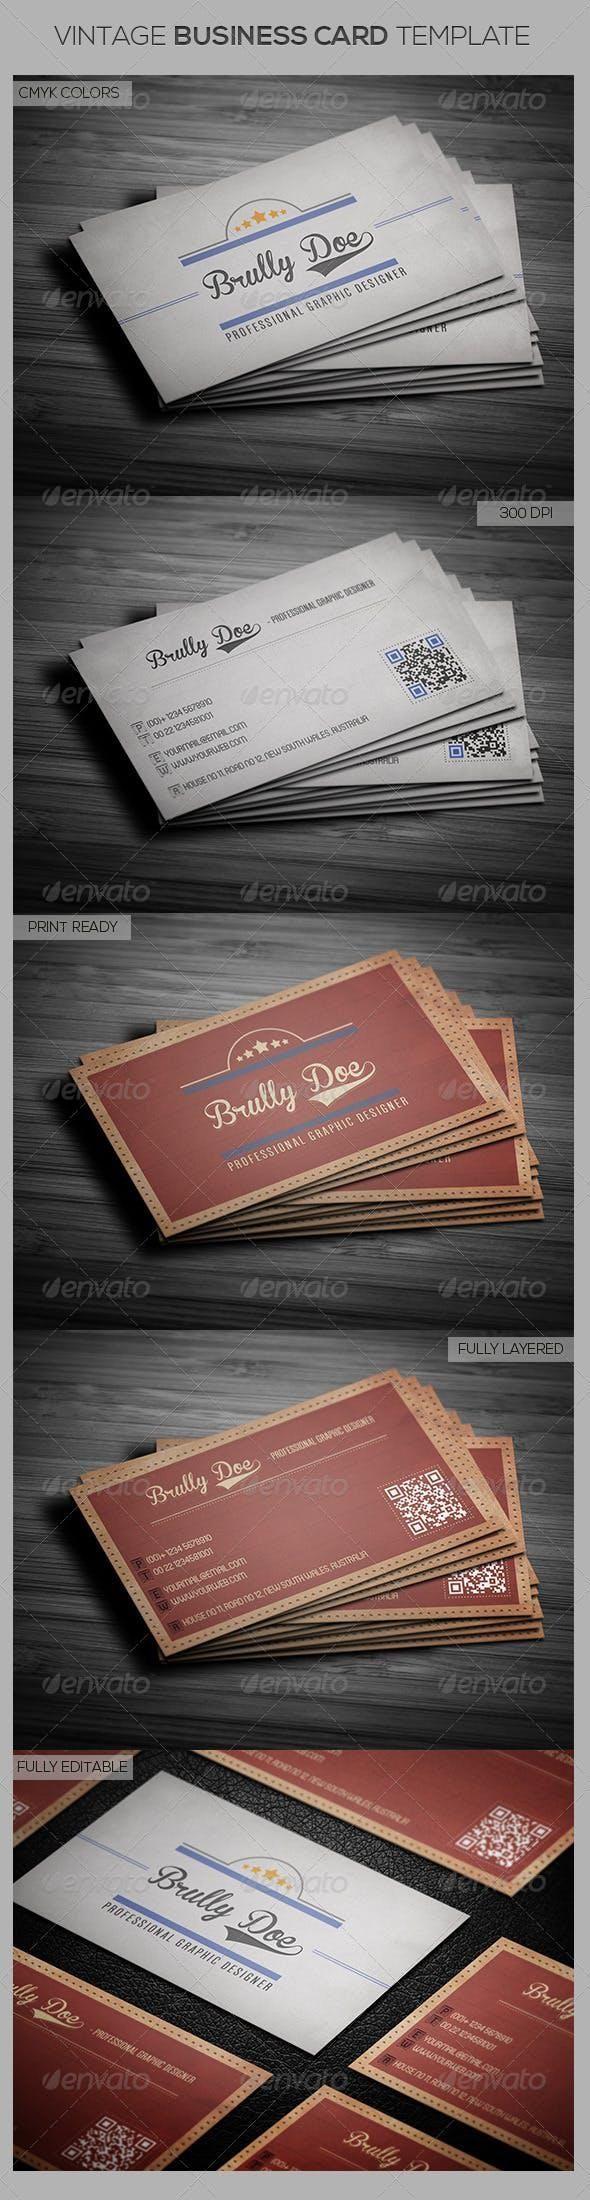 Vintage Business Card Template Vintage Business Cards Template Retro Business Card Business Card Template